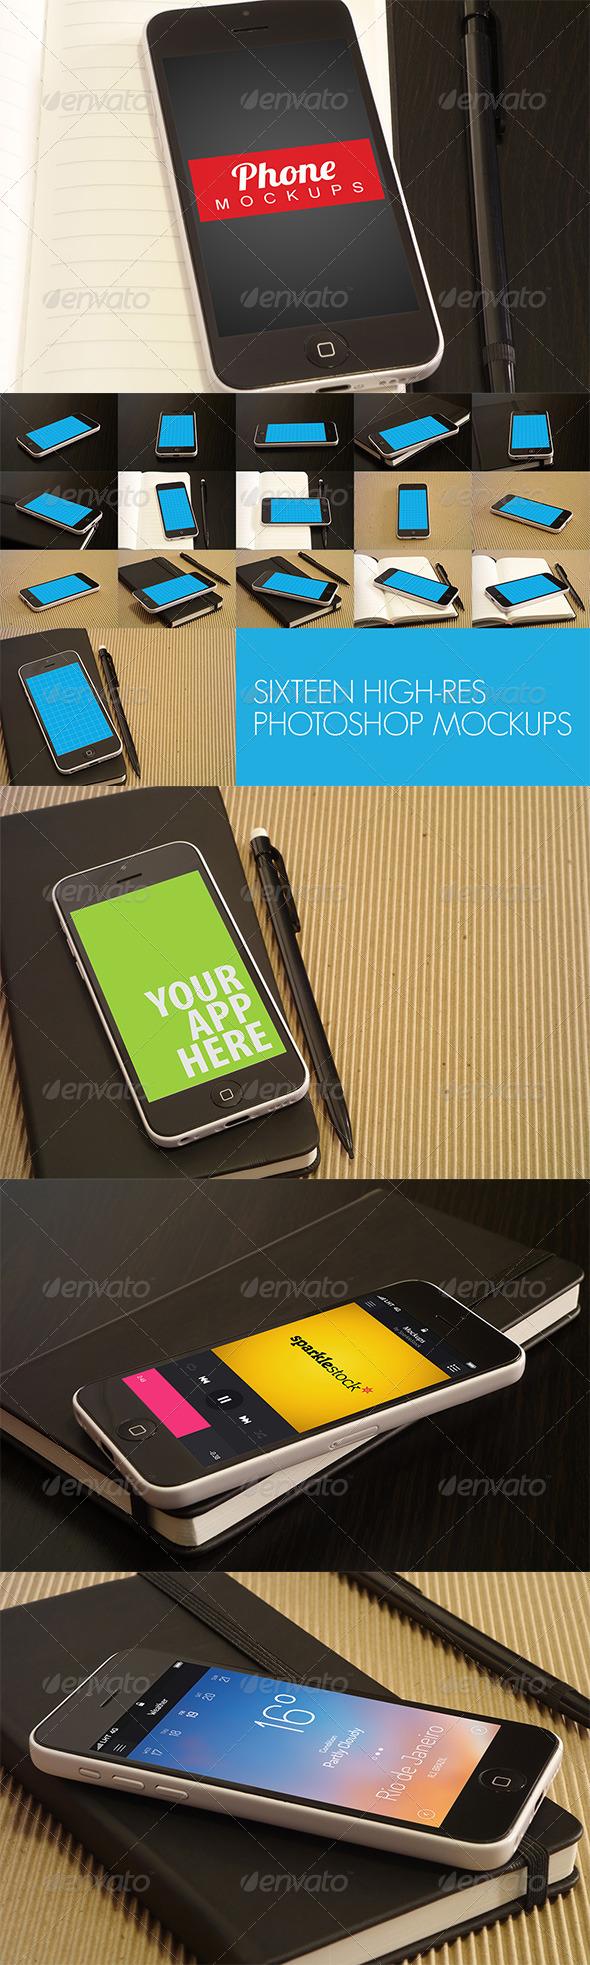 GraphicRiver 16 Phone Mockups 6556049